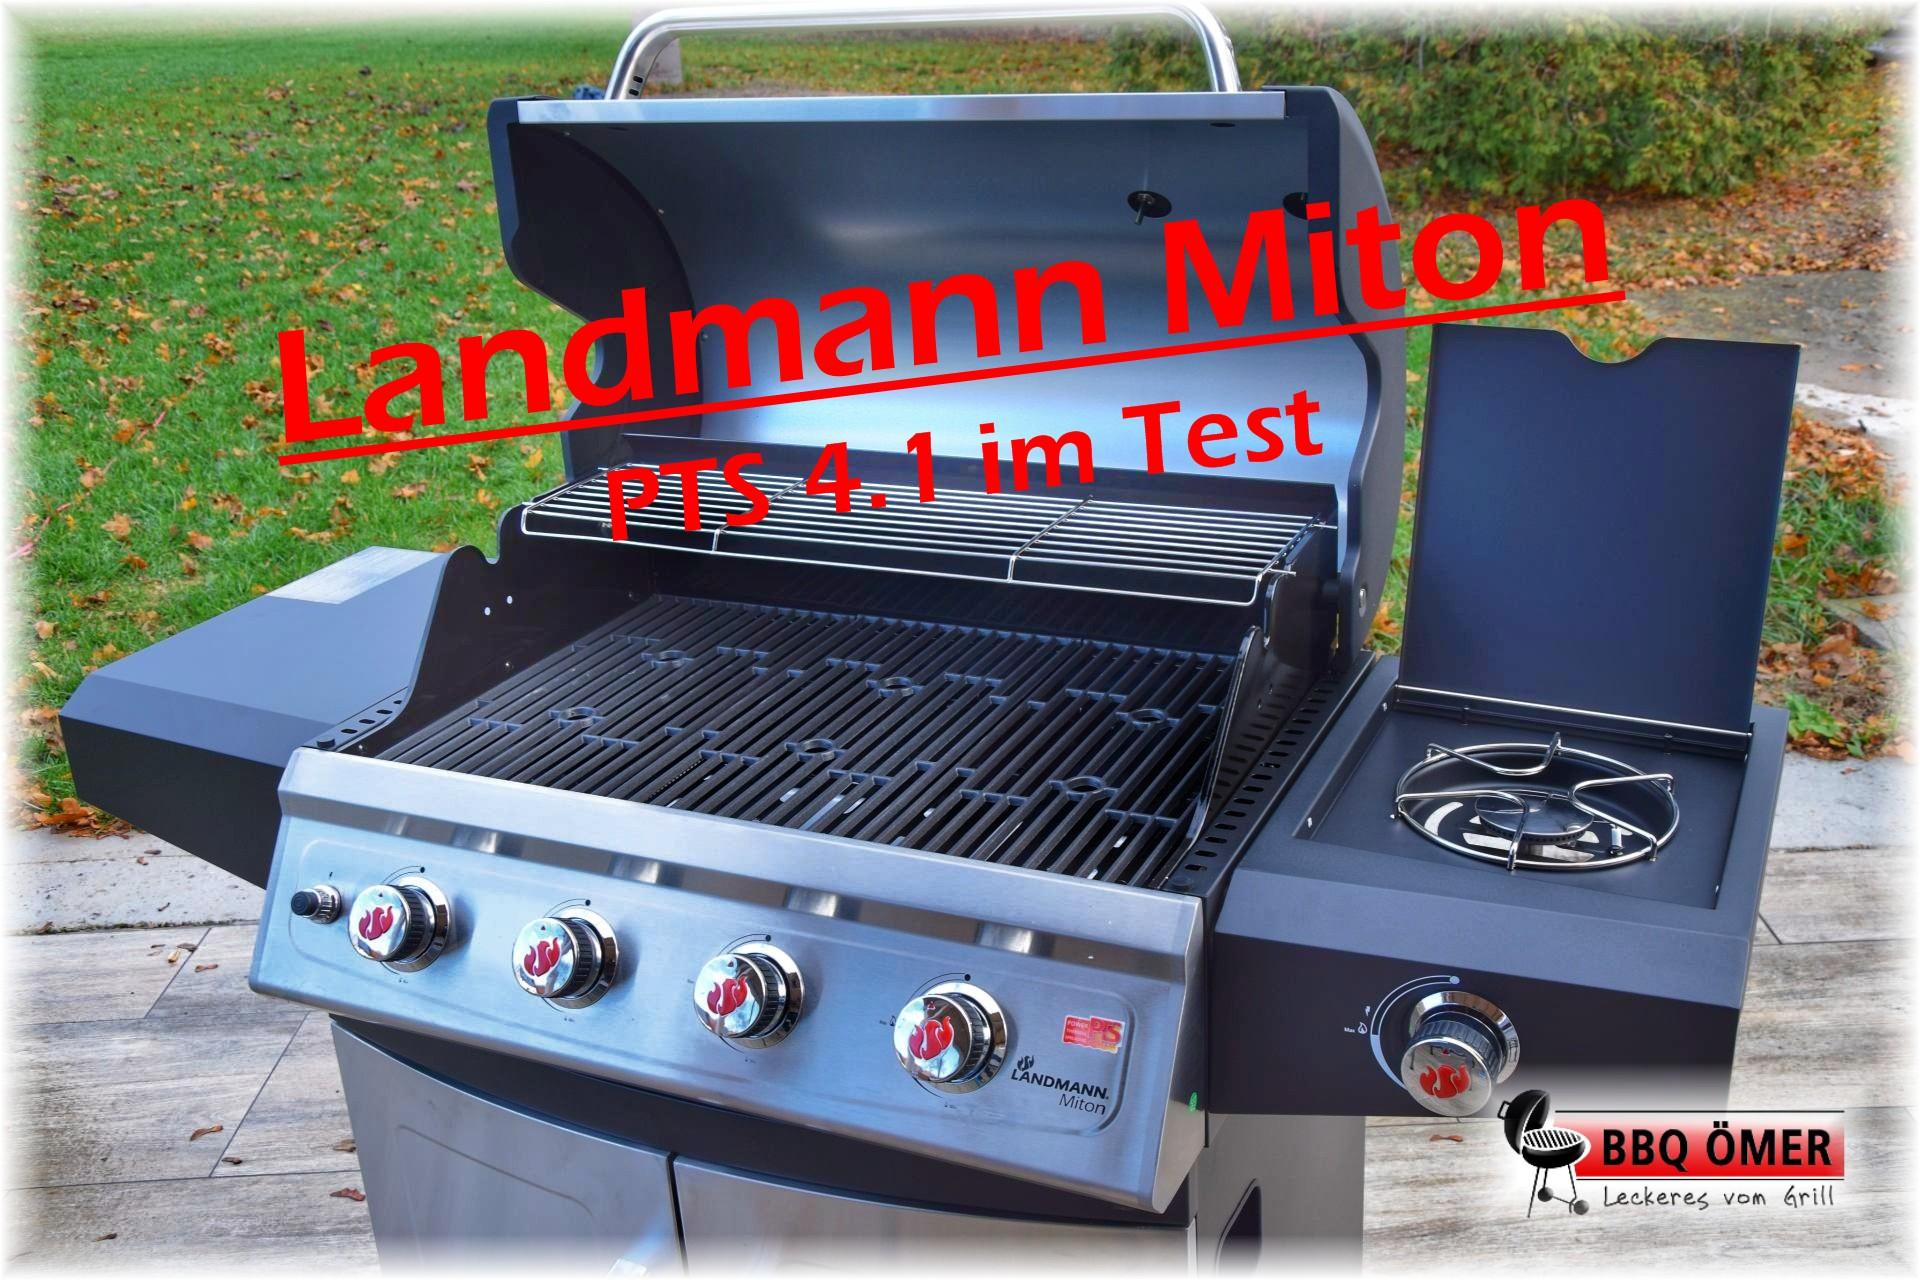 Landmann Gasgrill Im Test : Landmann miton pts 4.1 im test the american way bbq Ömer